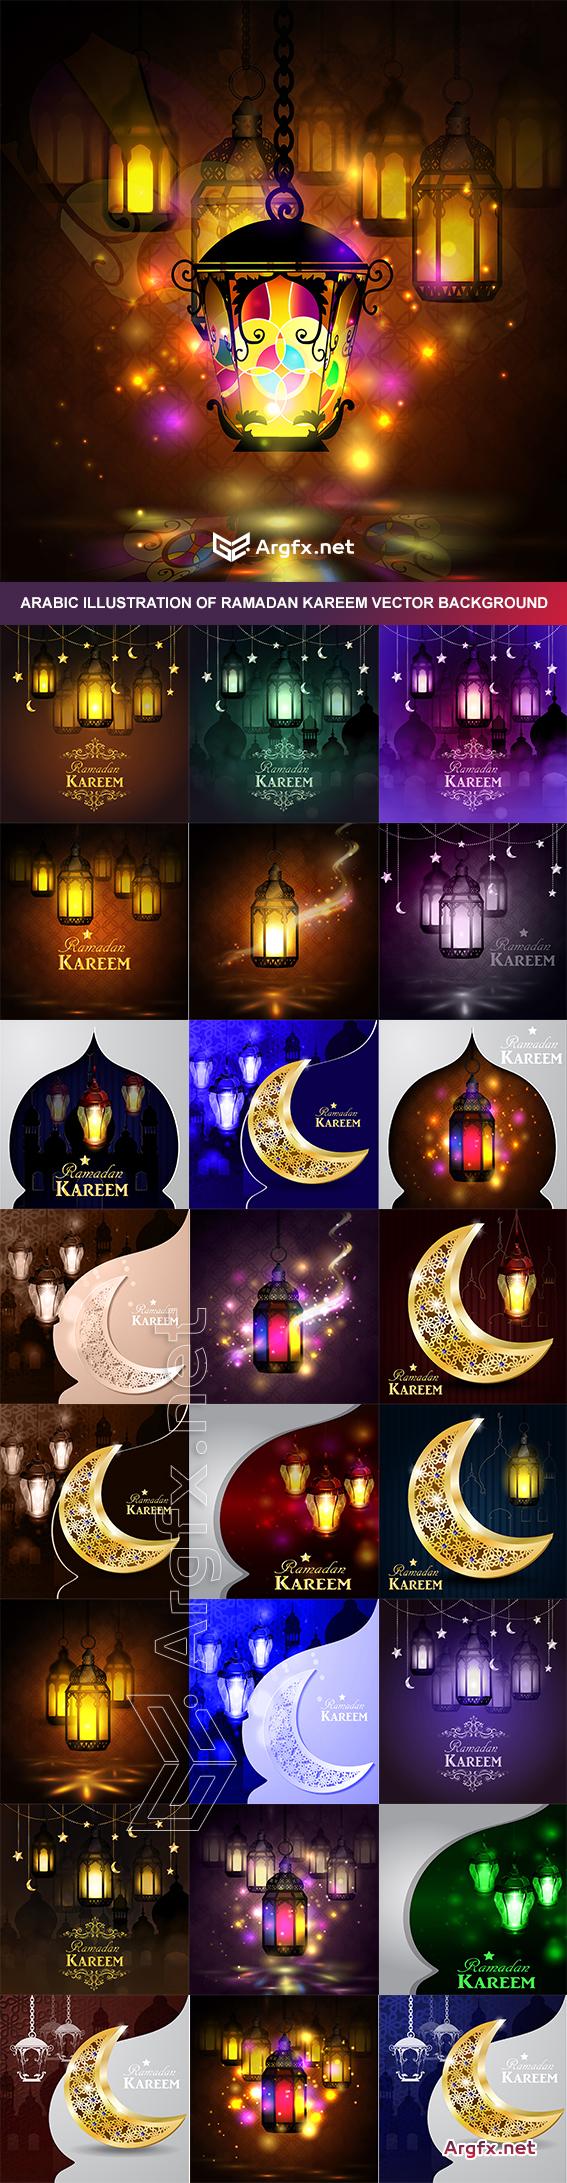 Arabic illustration of Ramadan Kareem vector background